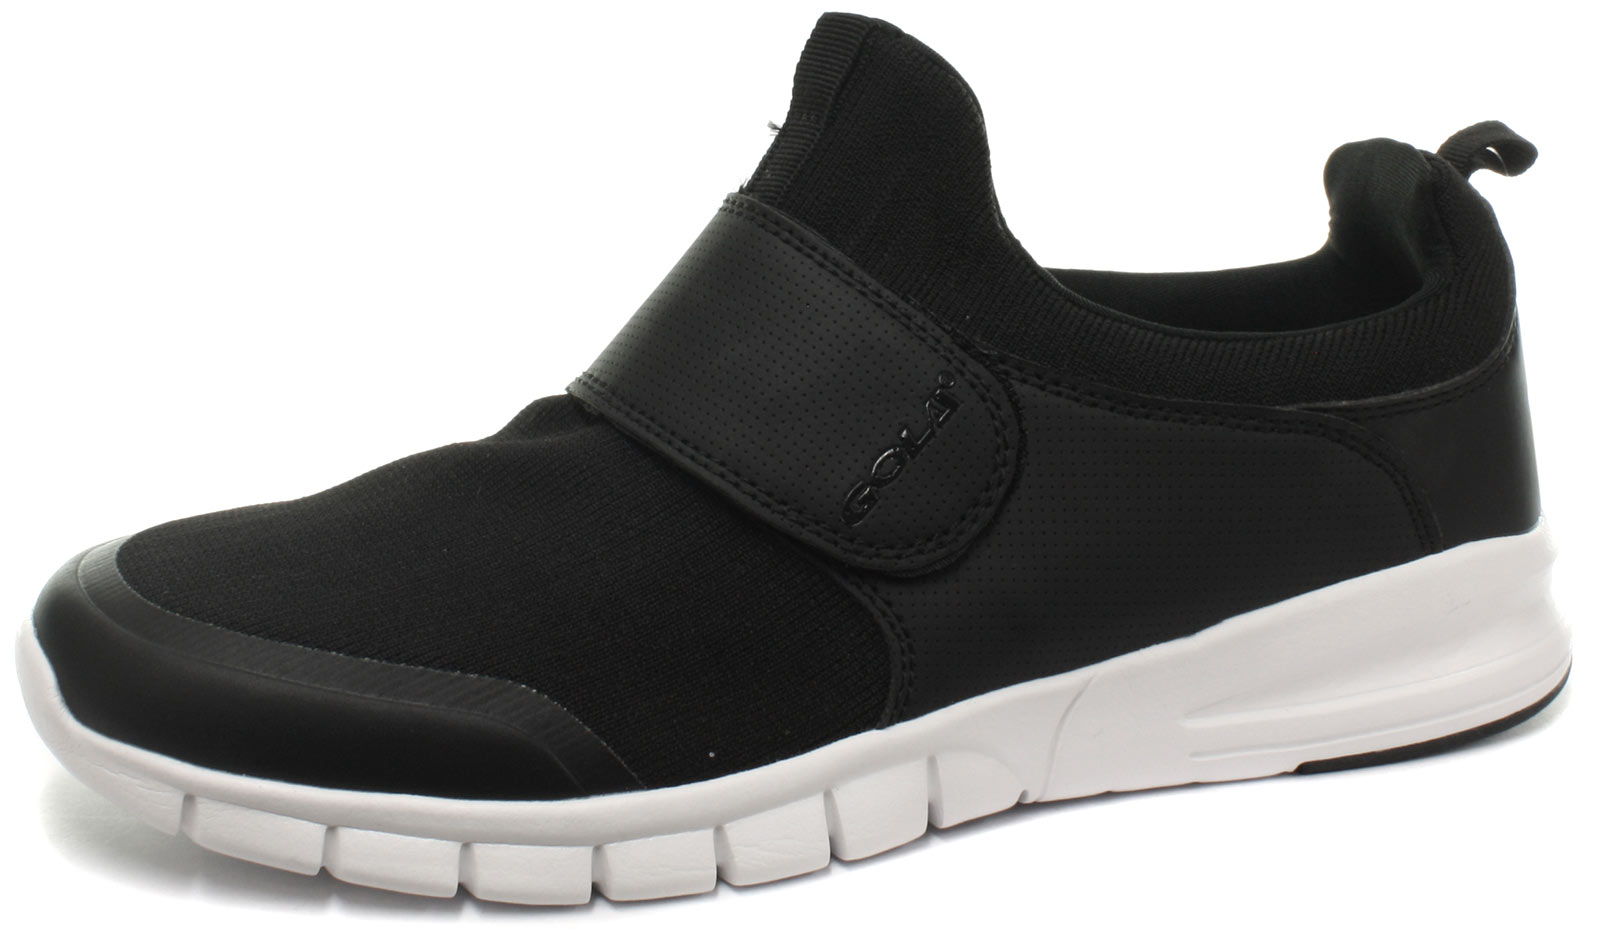 Nuovo Gola Active Lupus black shoes Sportive da men Tutte le Misure